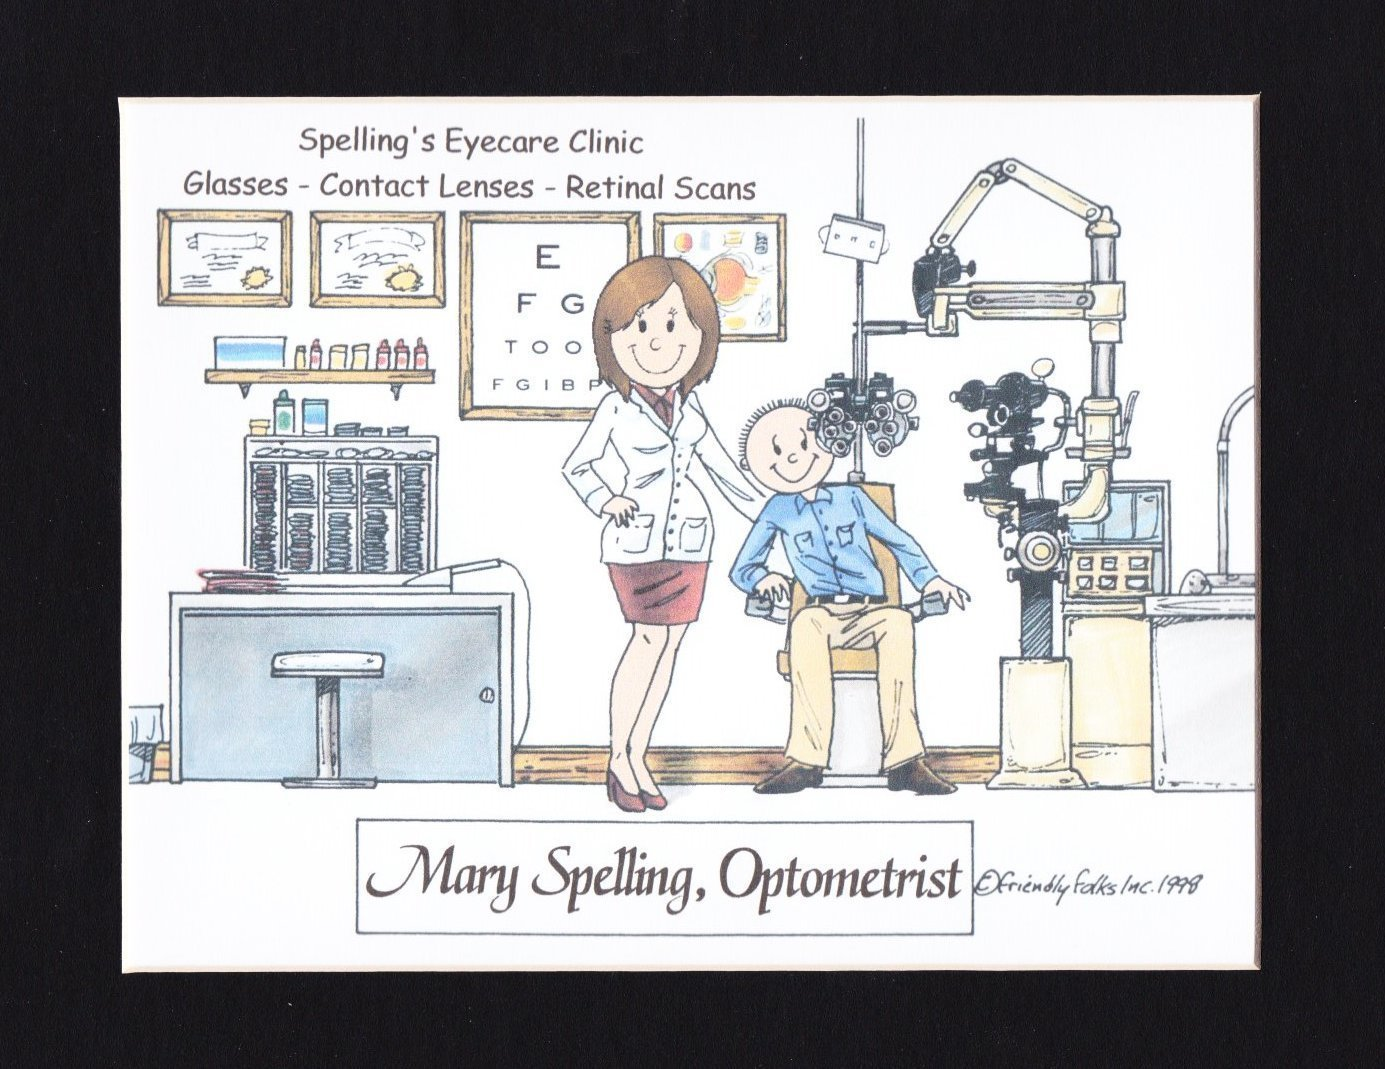 Optometrist Personalized Gift Custom Cartoon Print 8x10, 9x12 Magnet or Keychain